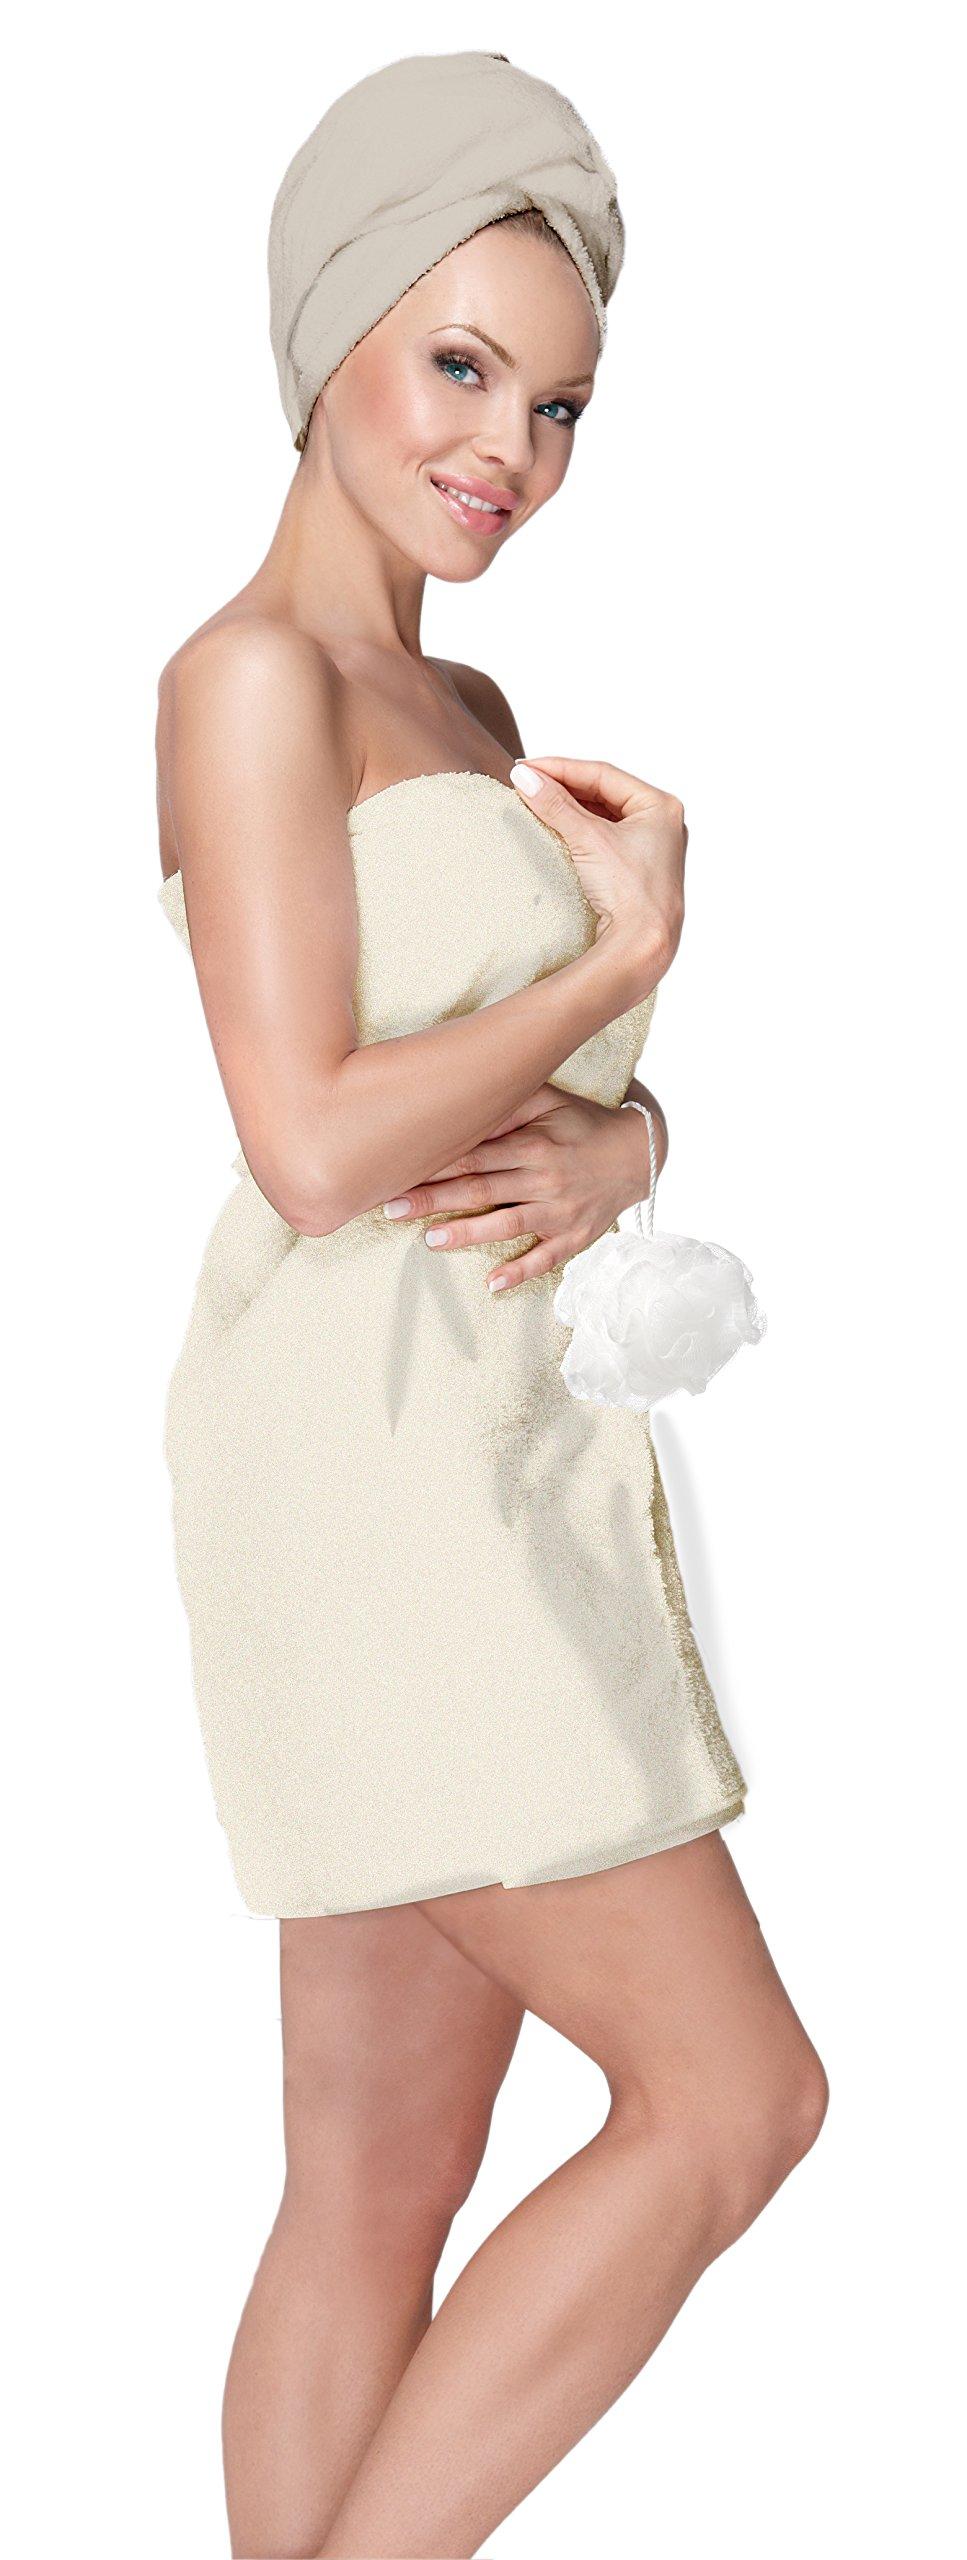 Adrienne Vittadini Women's 3 Piece Bath Body Plush Shower Towel Wrap Spa Set | Bath Body Towel Wrap with Adjustable Fastener, Hair Towel Twist, Loofah/Bath Body Sponge by Adrienne Vittadino (Image #1)